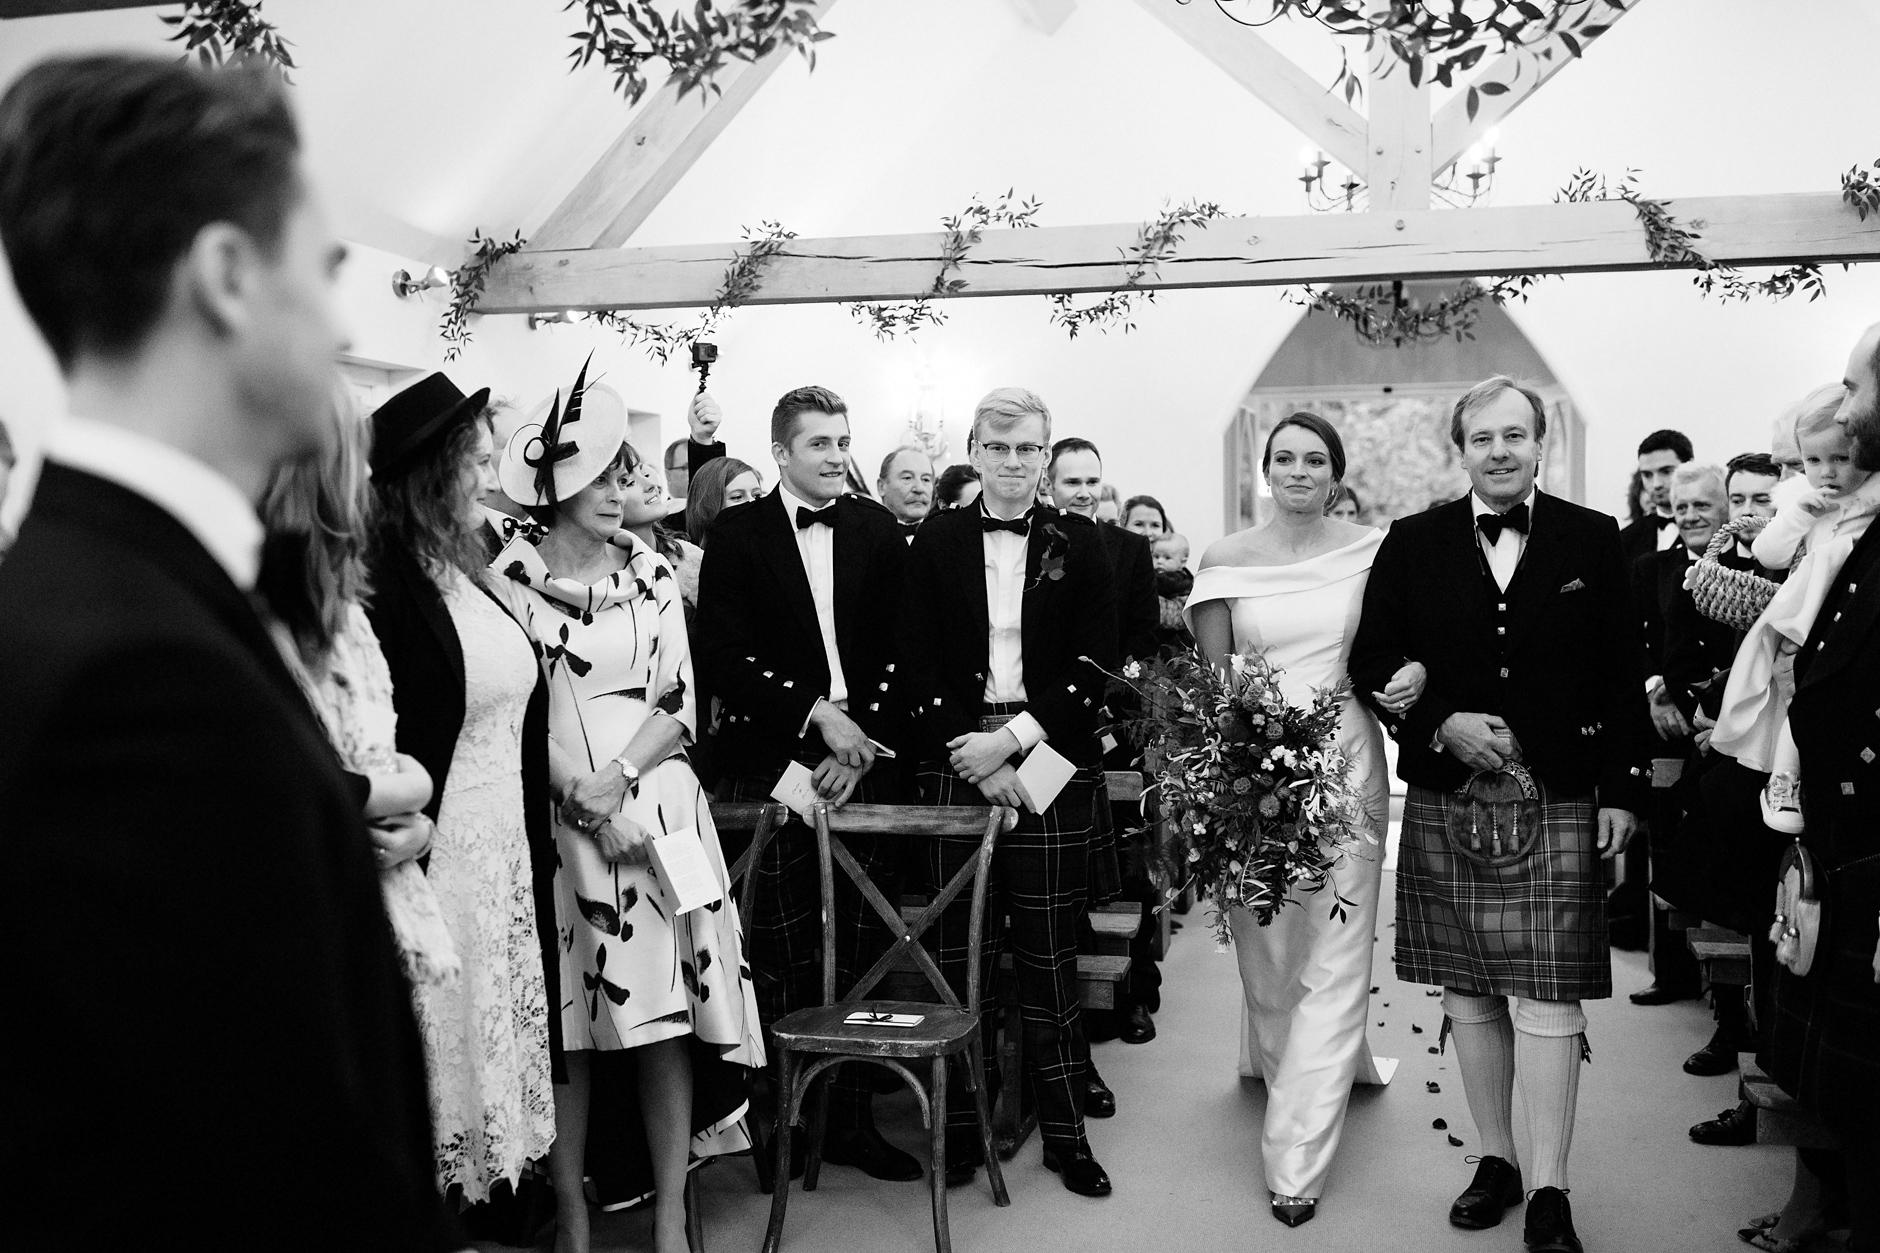 Glentruim-Wedding-Nikki-Leadbetter-Photography-76.jpg